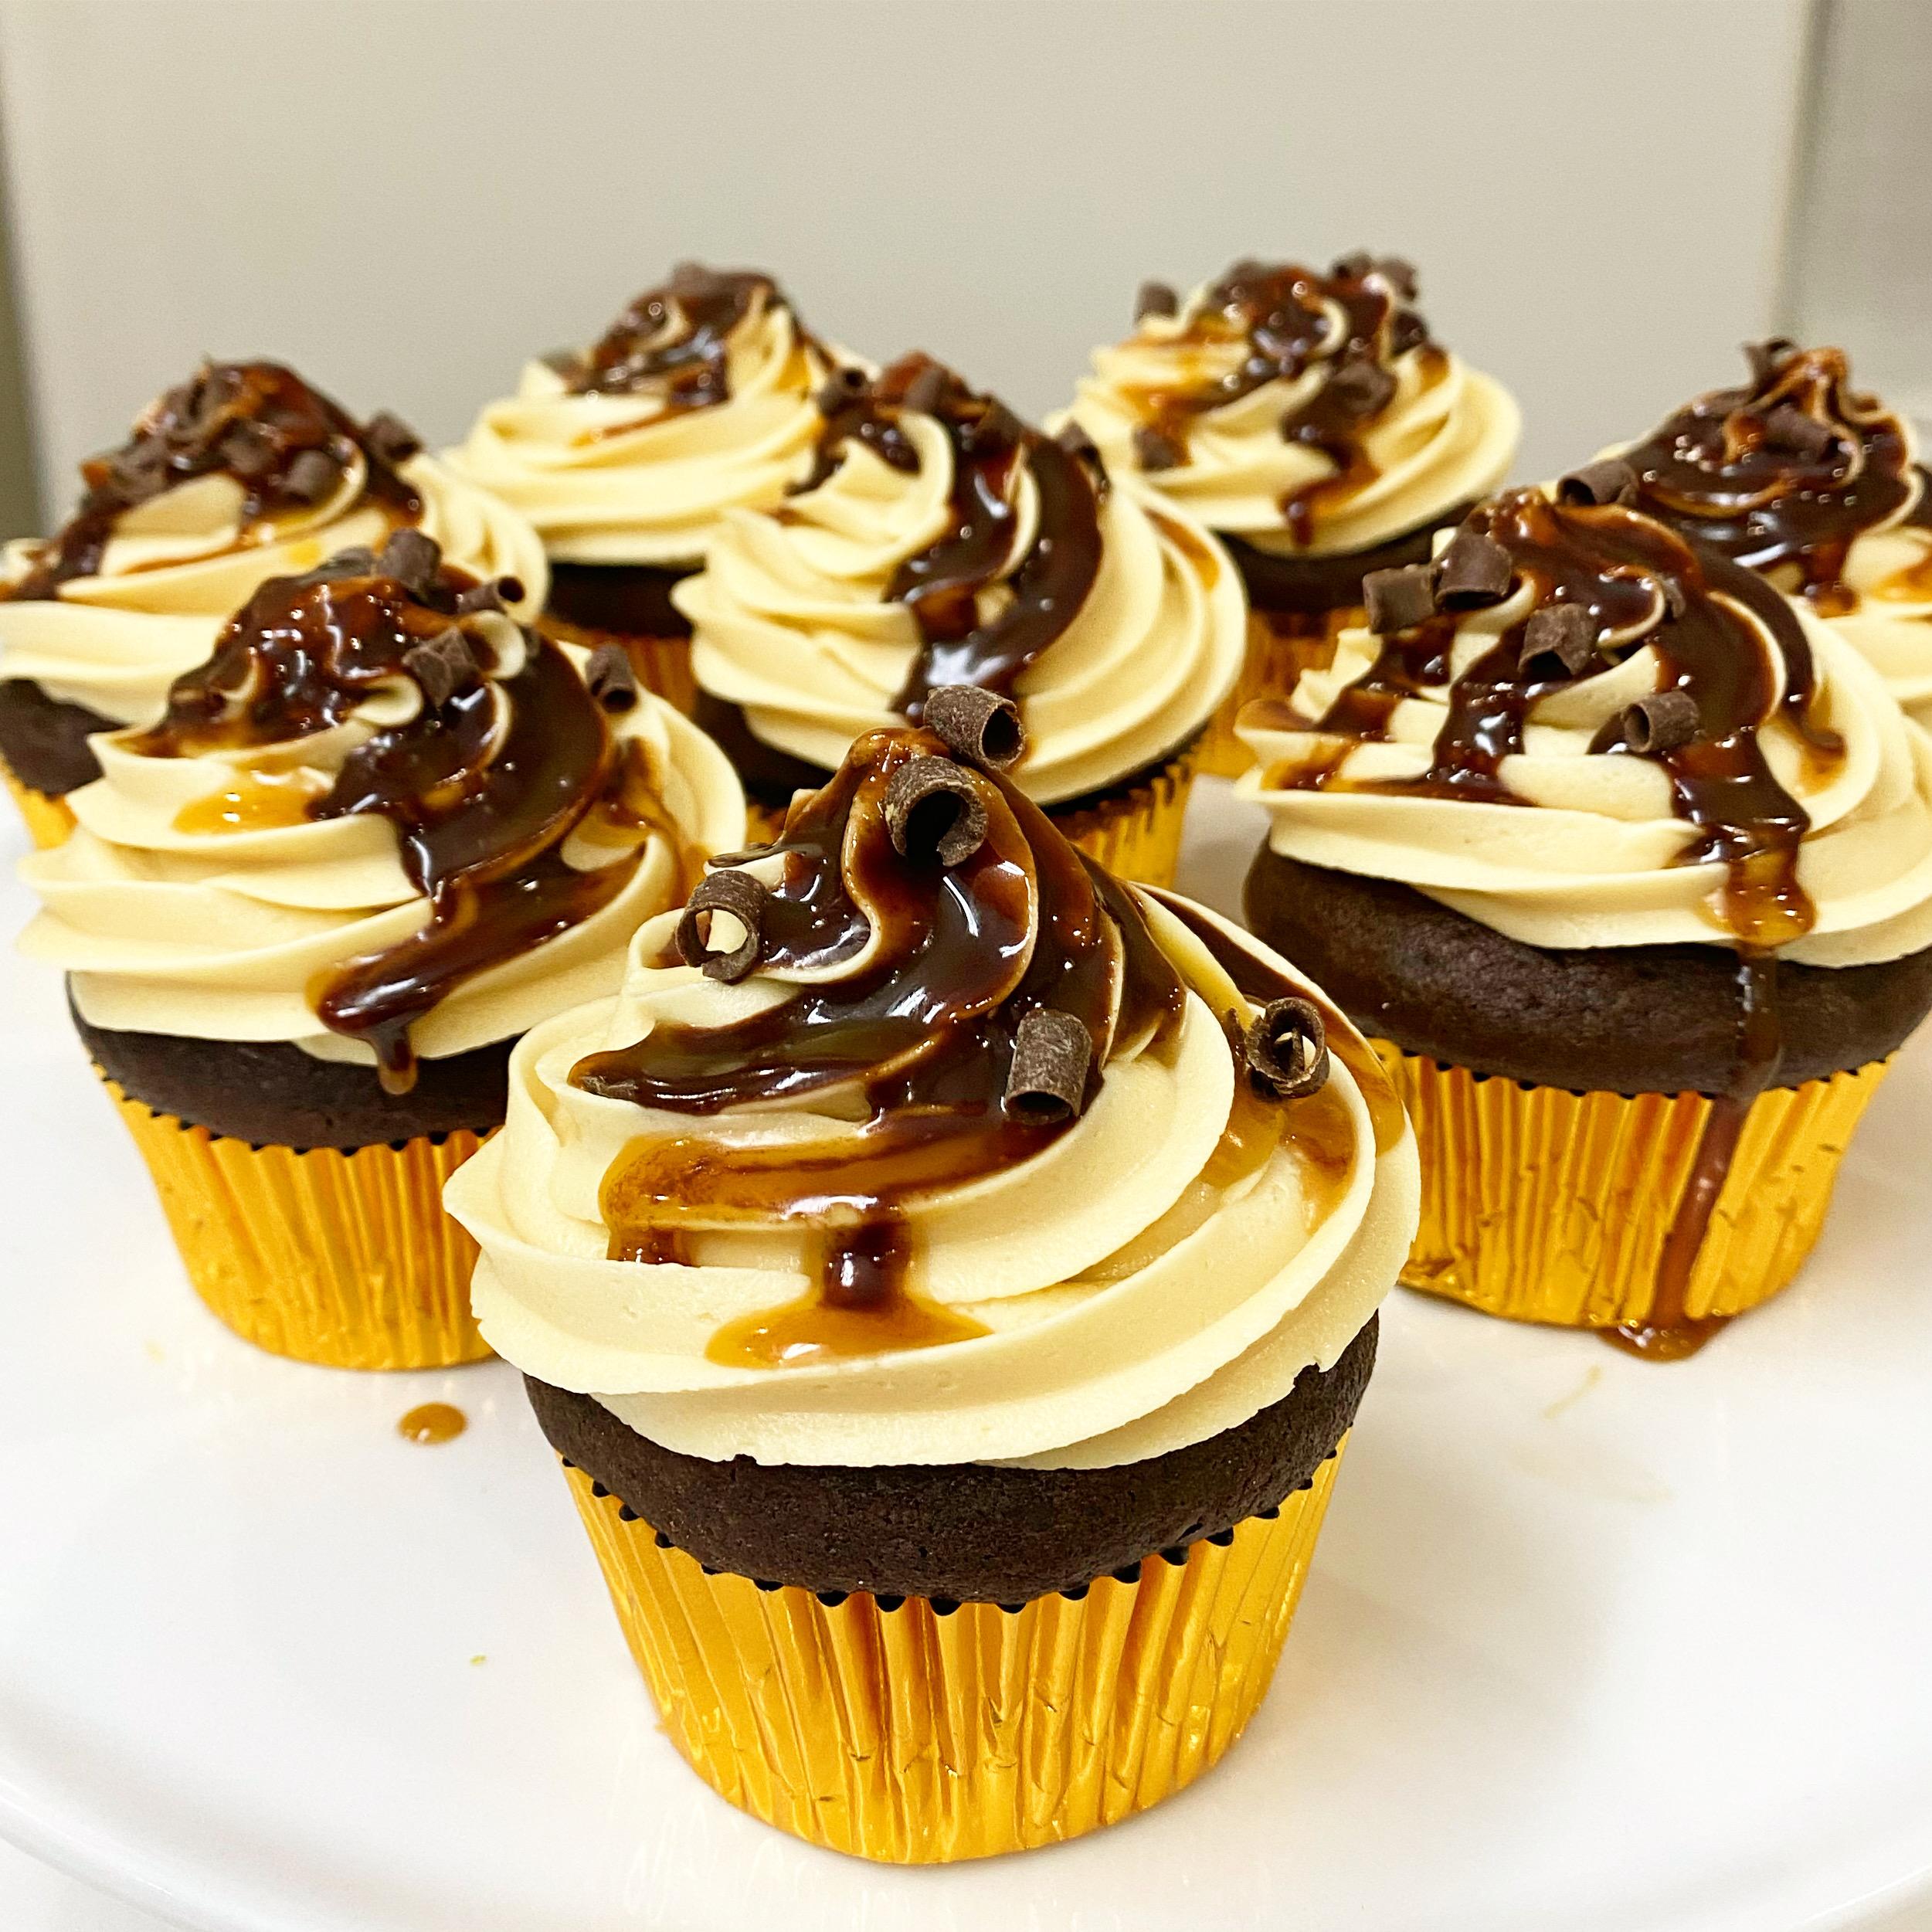 ChocolateCaramelCupcakes